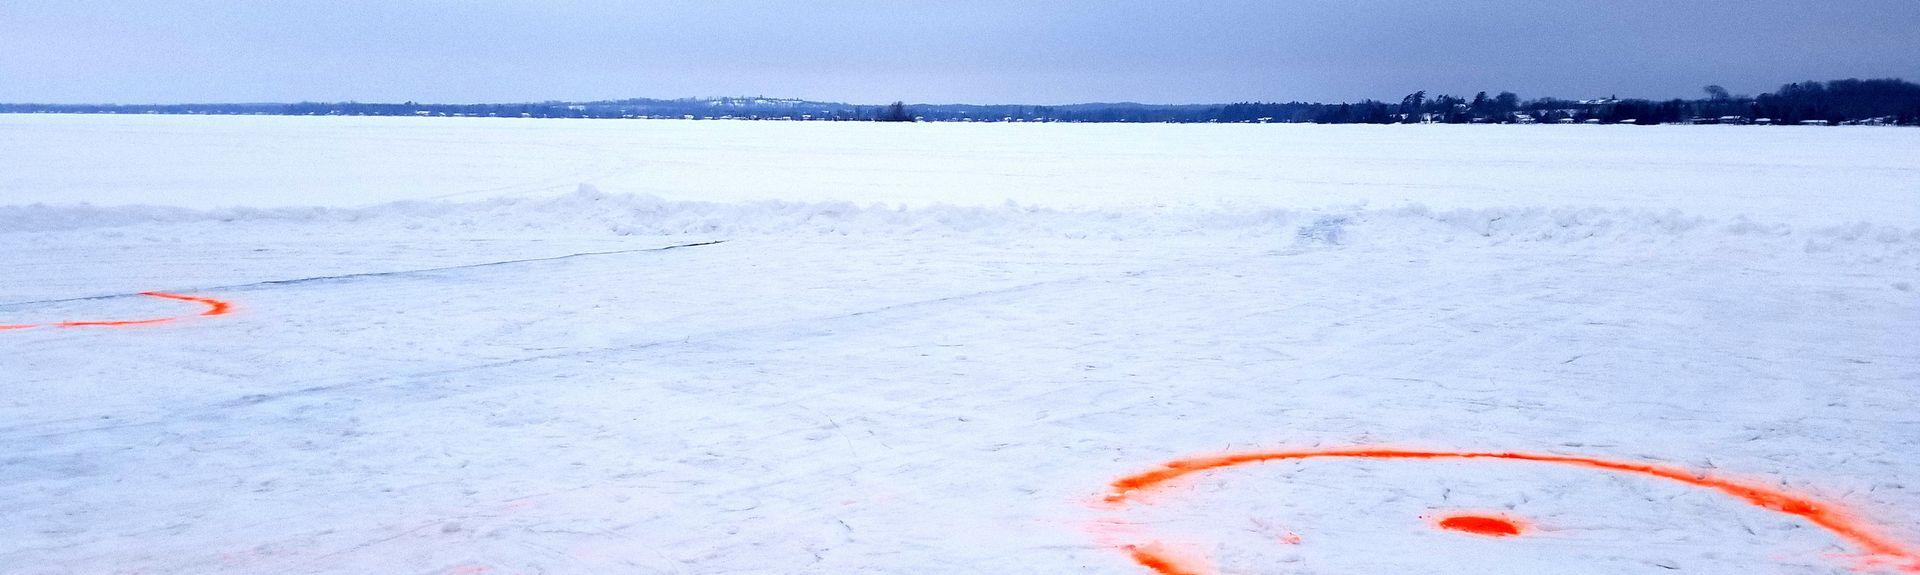 Sandy Lake, Trent Lakes, Ontario, Canada